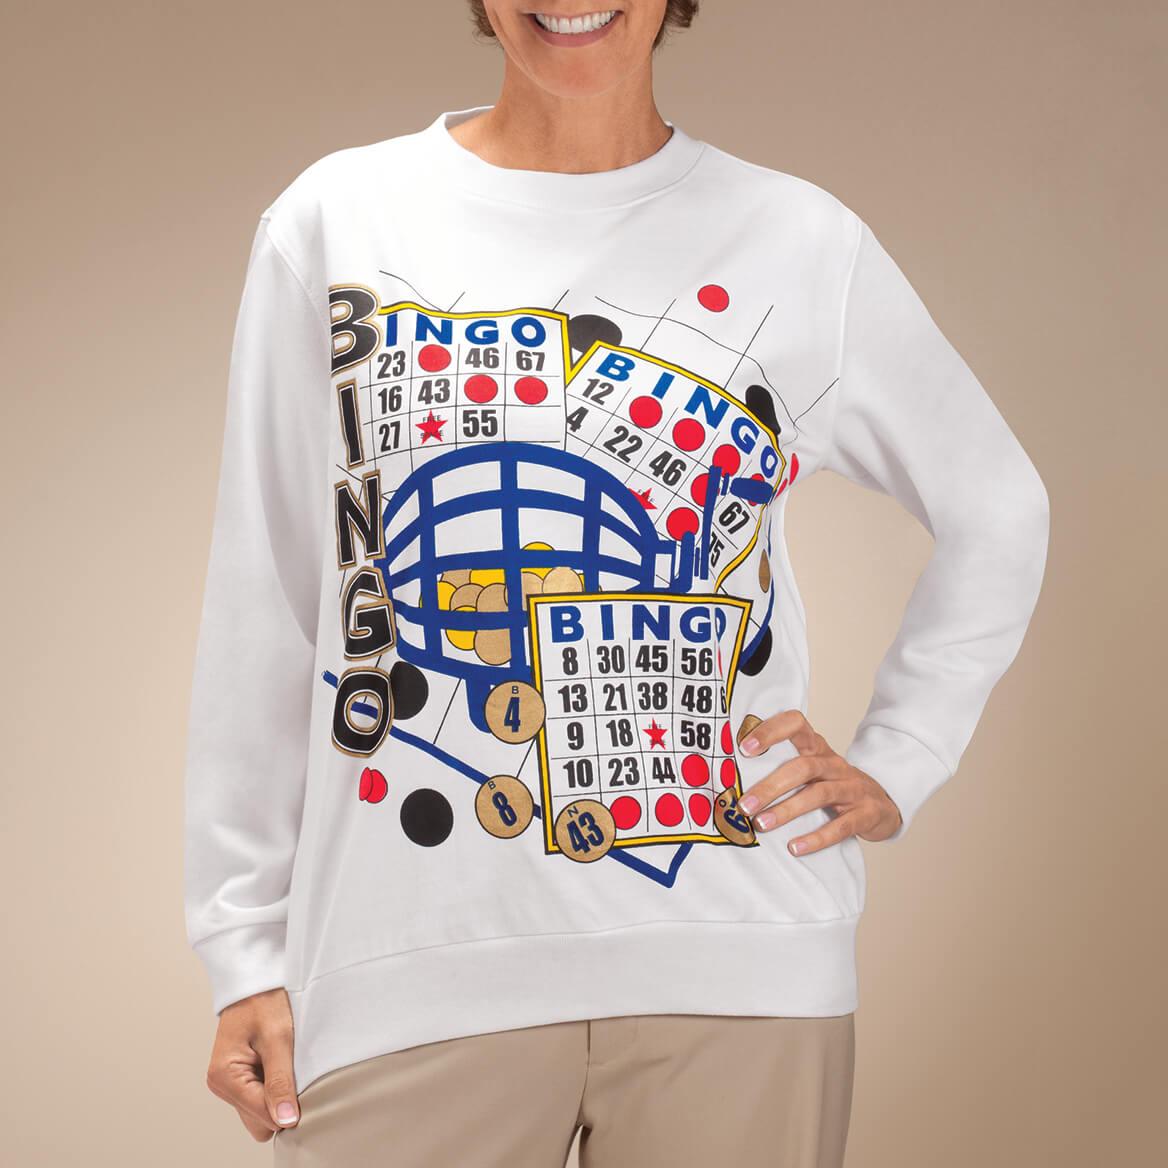 Bingo Sweatshirt by Sawyer Creek-361356